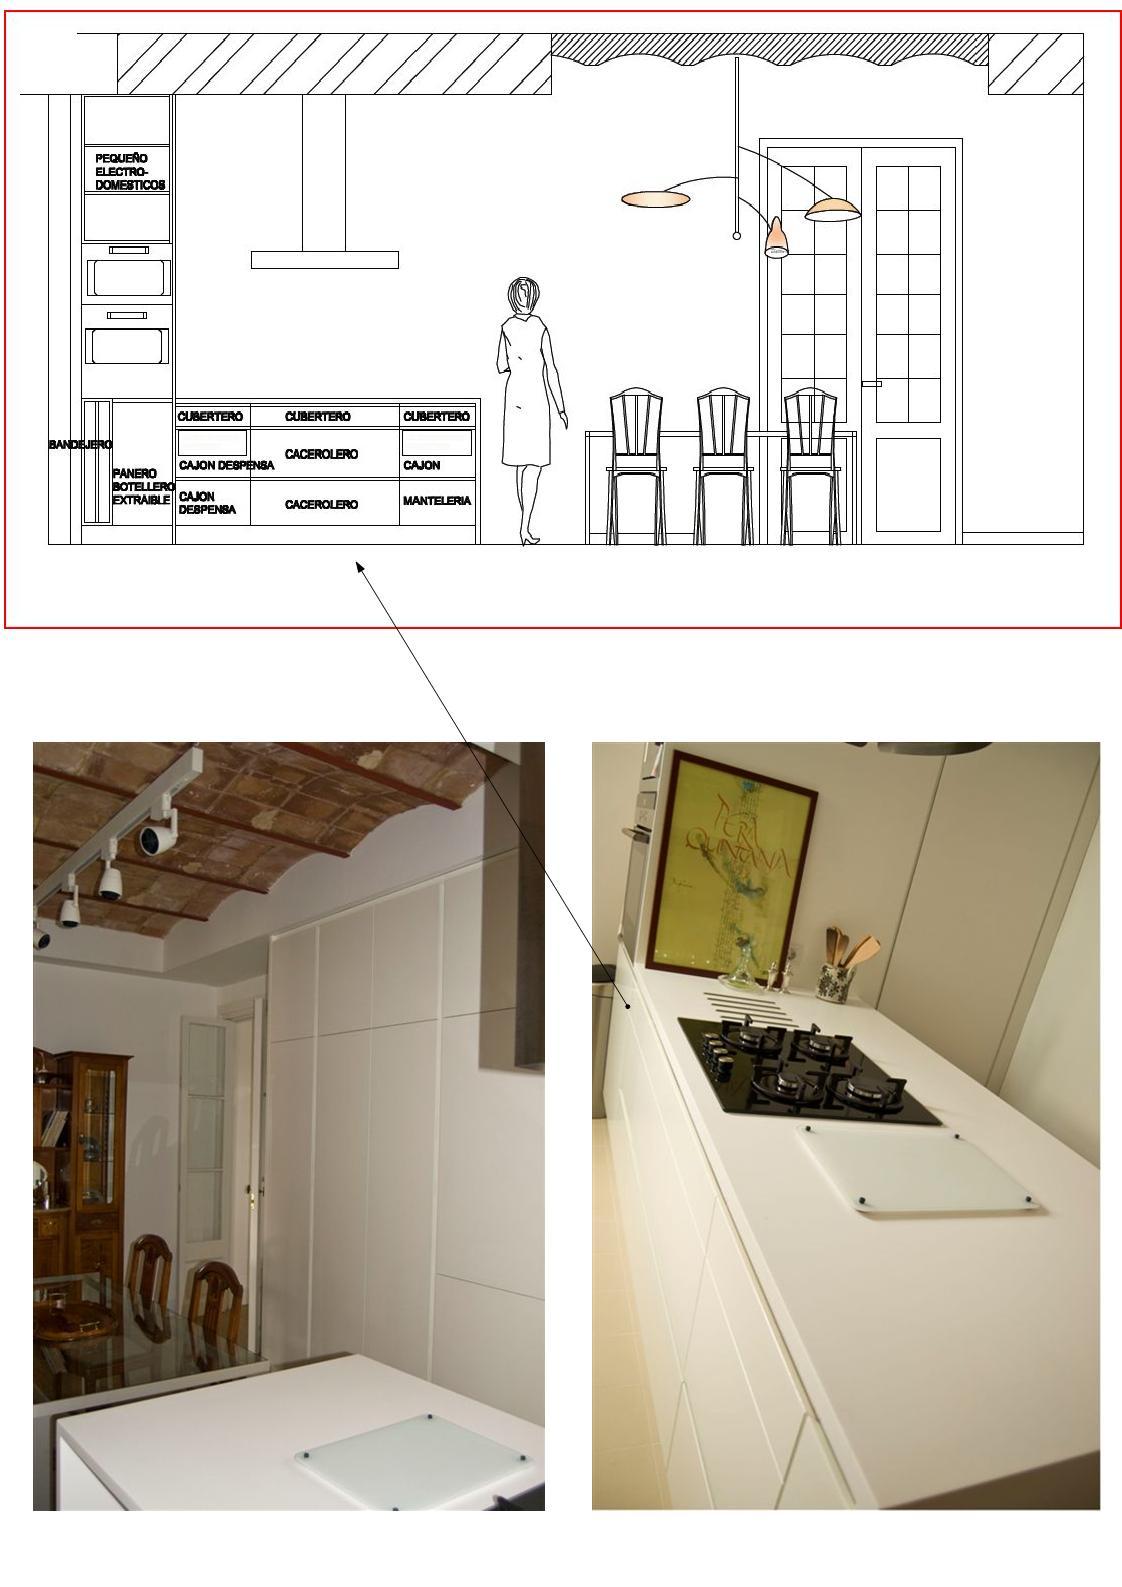 Carpinteria muebles a medida mobiliario de cocina en dm for Mobiliario cocina